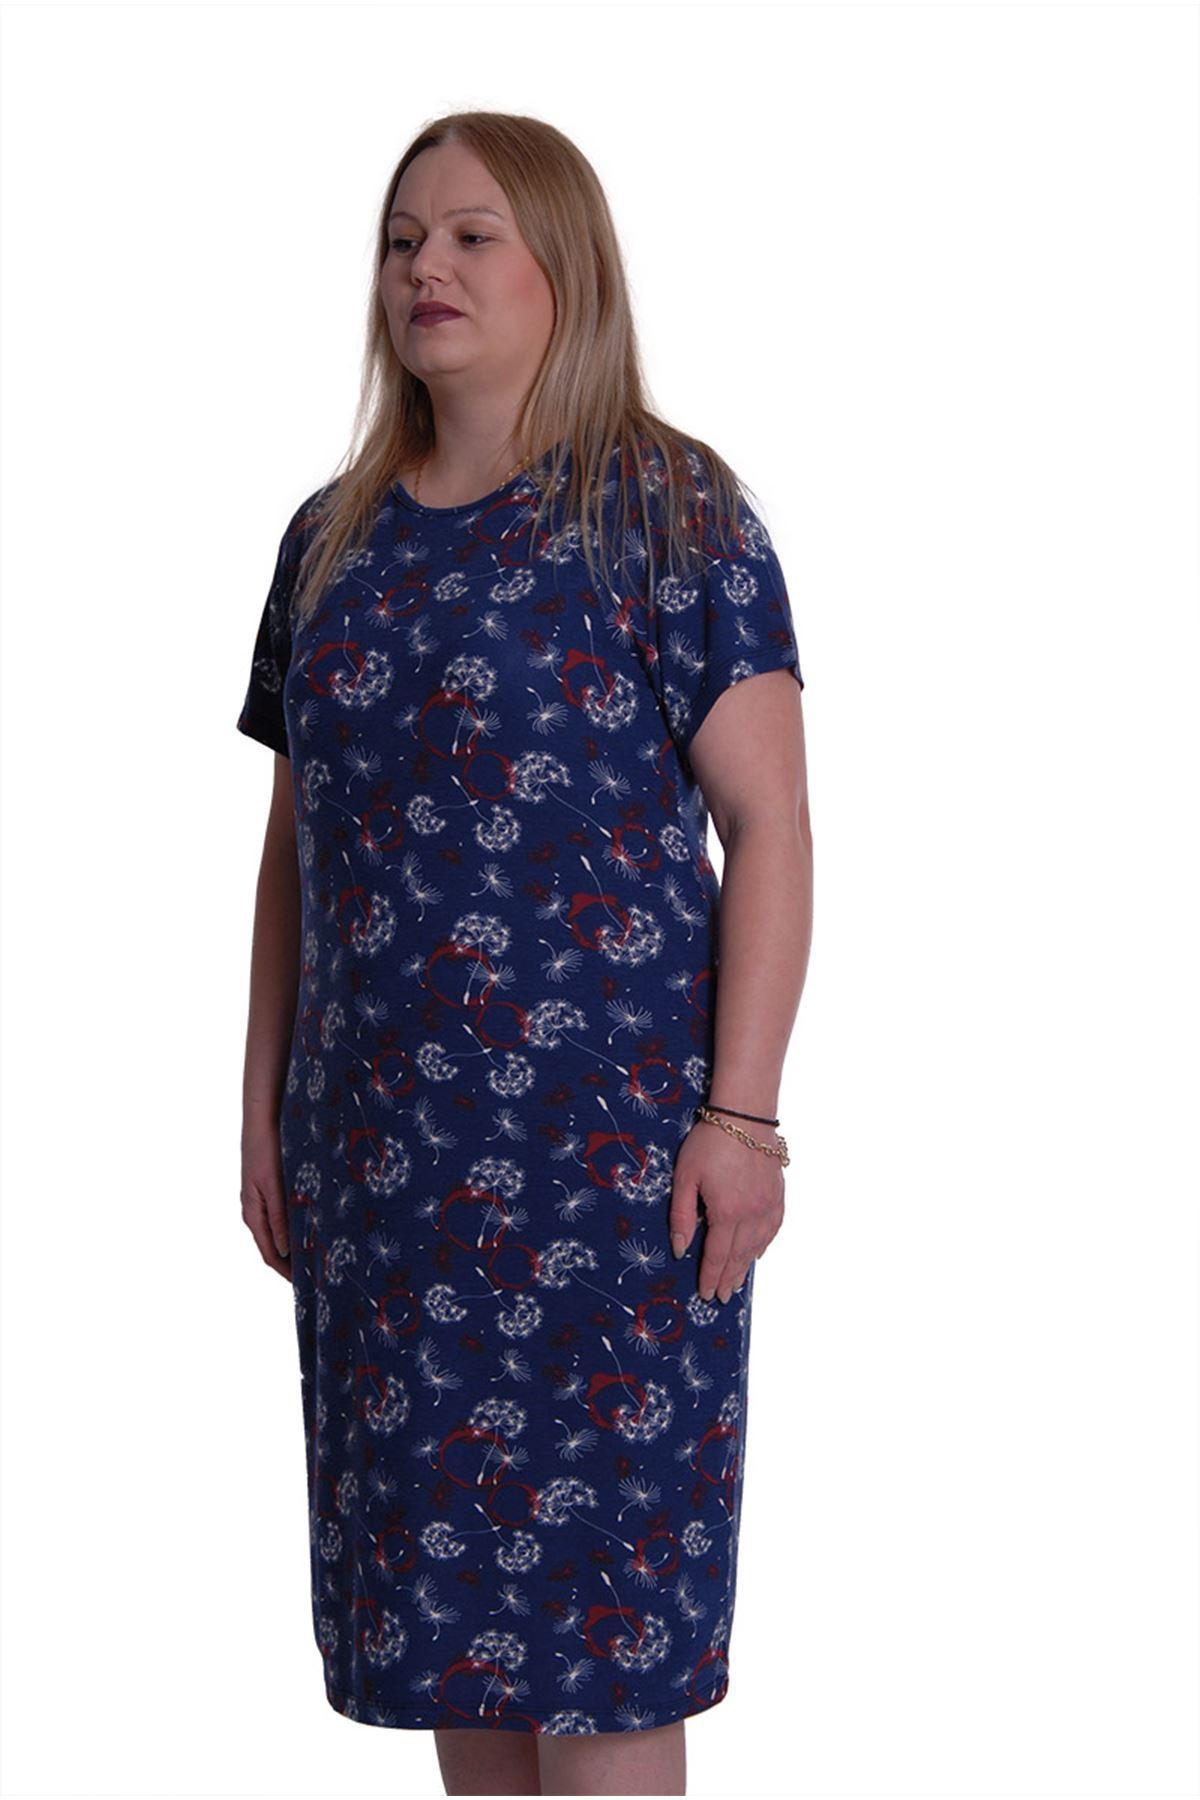 Büyük Beden Lacivert Cepli Elbise 2E-0088